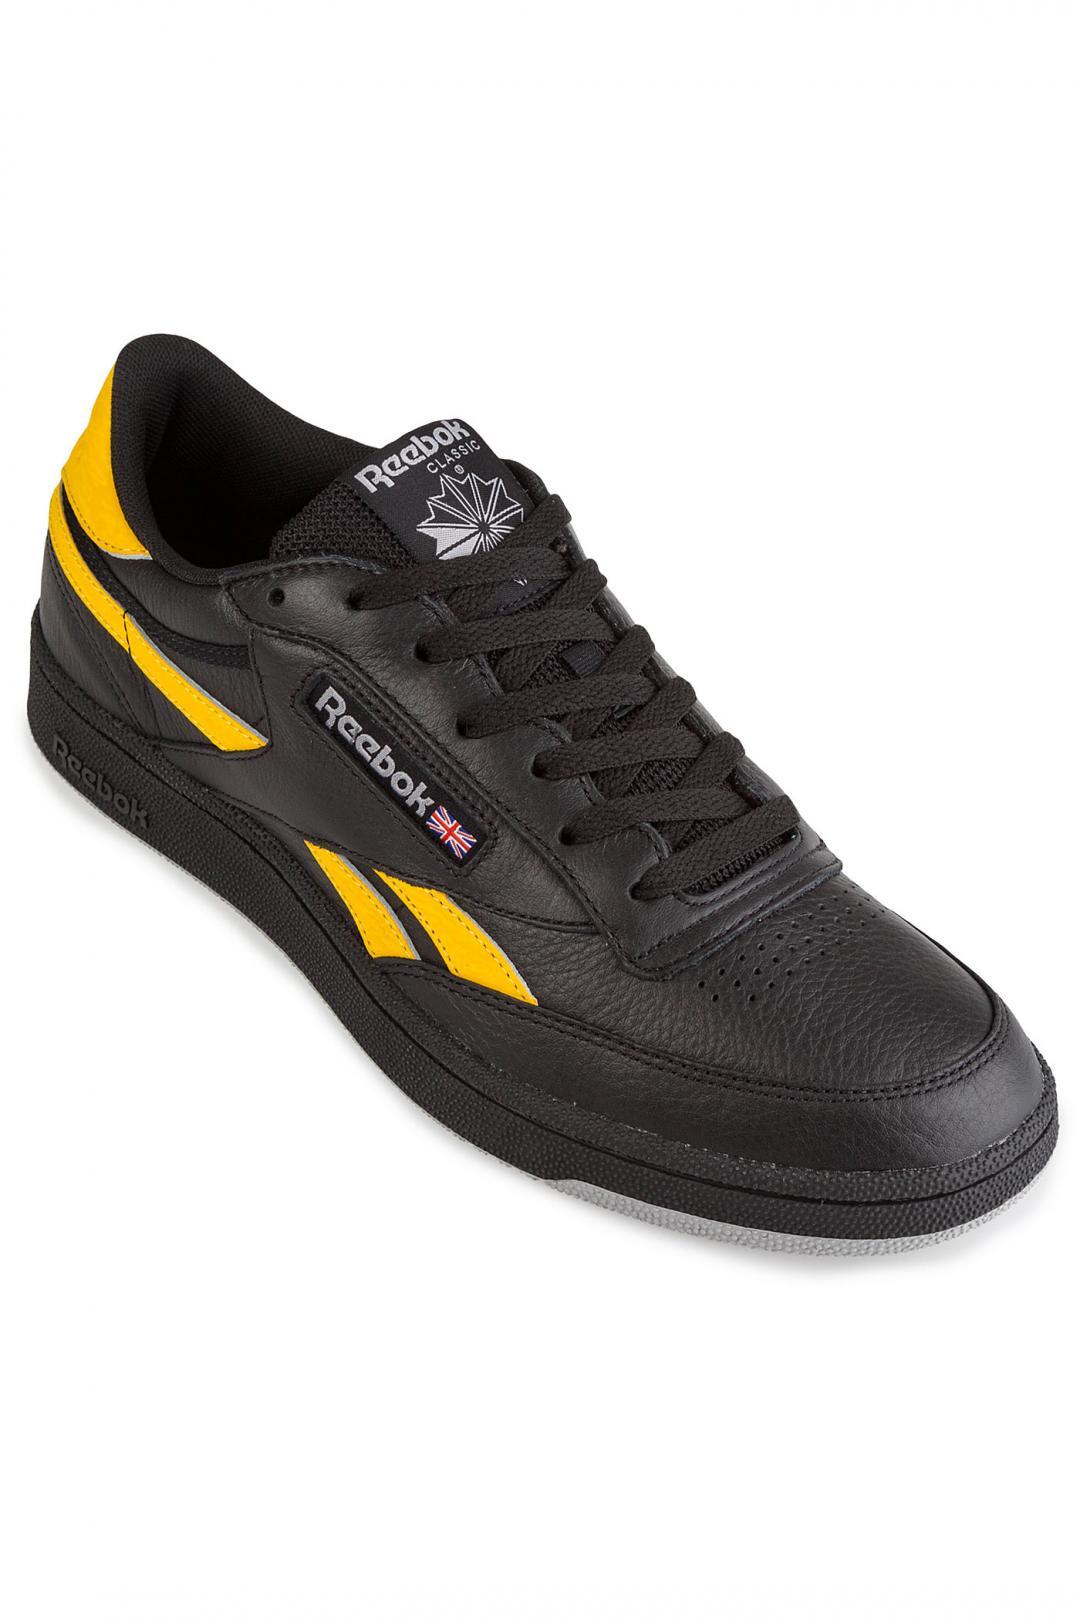 Uomo Reebok Revenge Plus MU black gold grey white | Sneaker